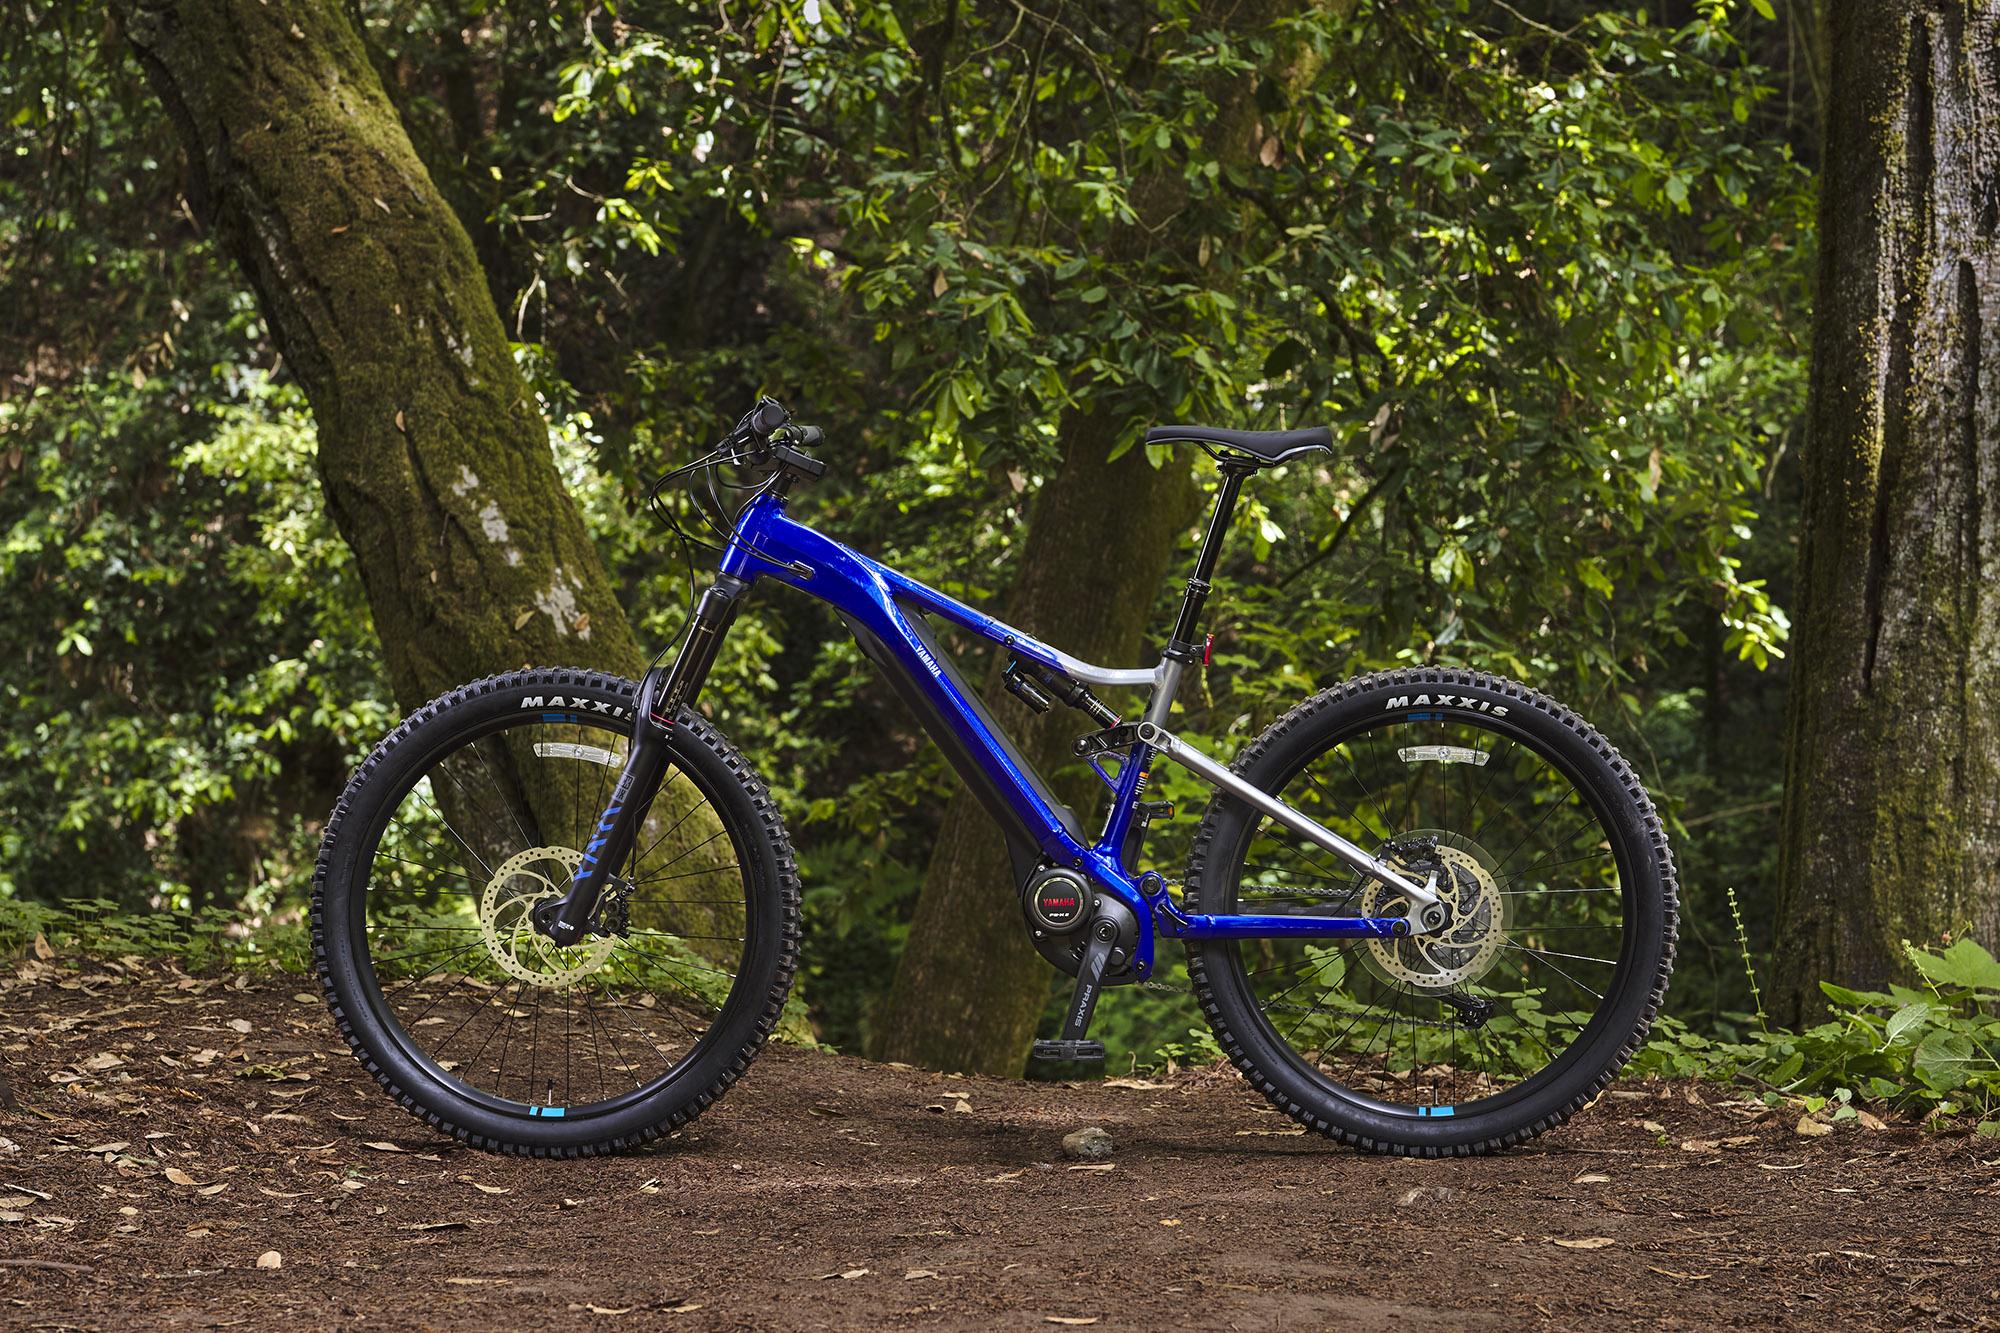 200730 Yamaha Reveals All-New YDX-MORO Pro All-Mountain e-Bike